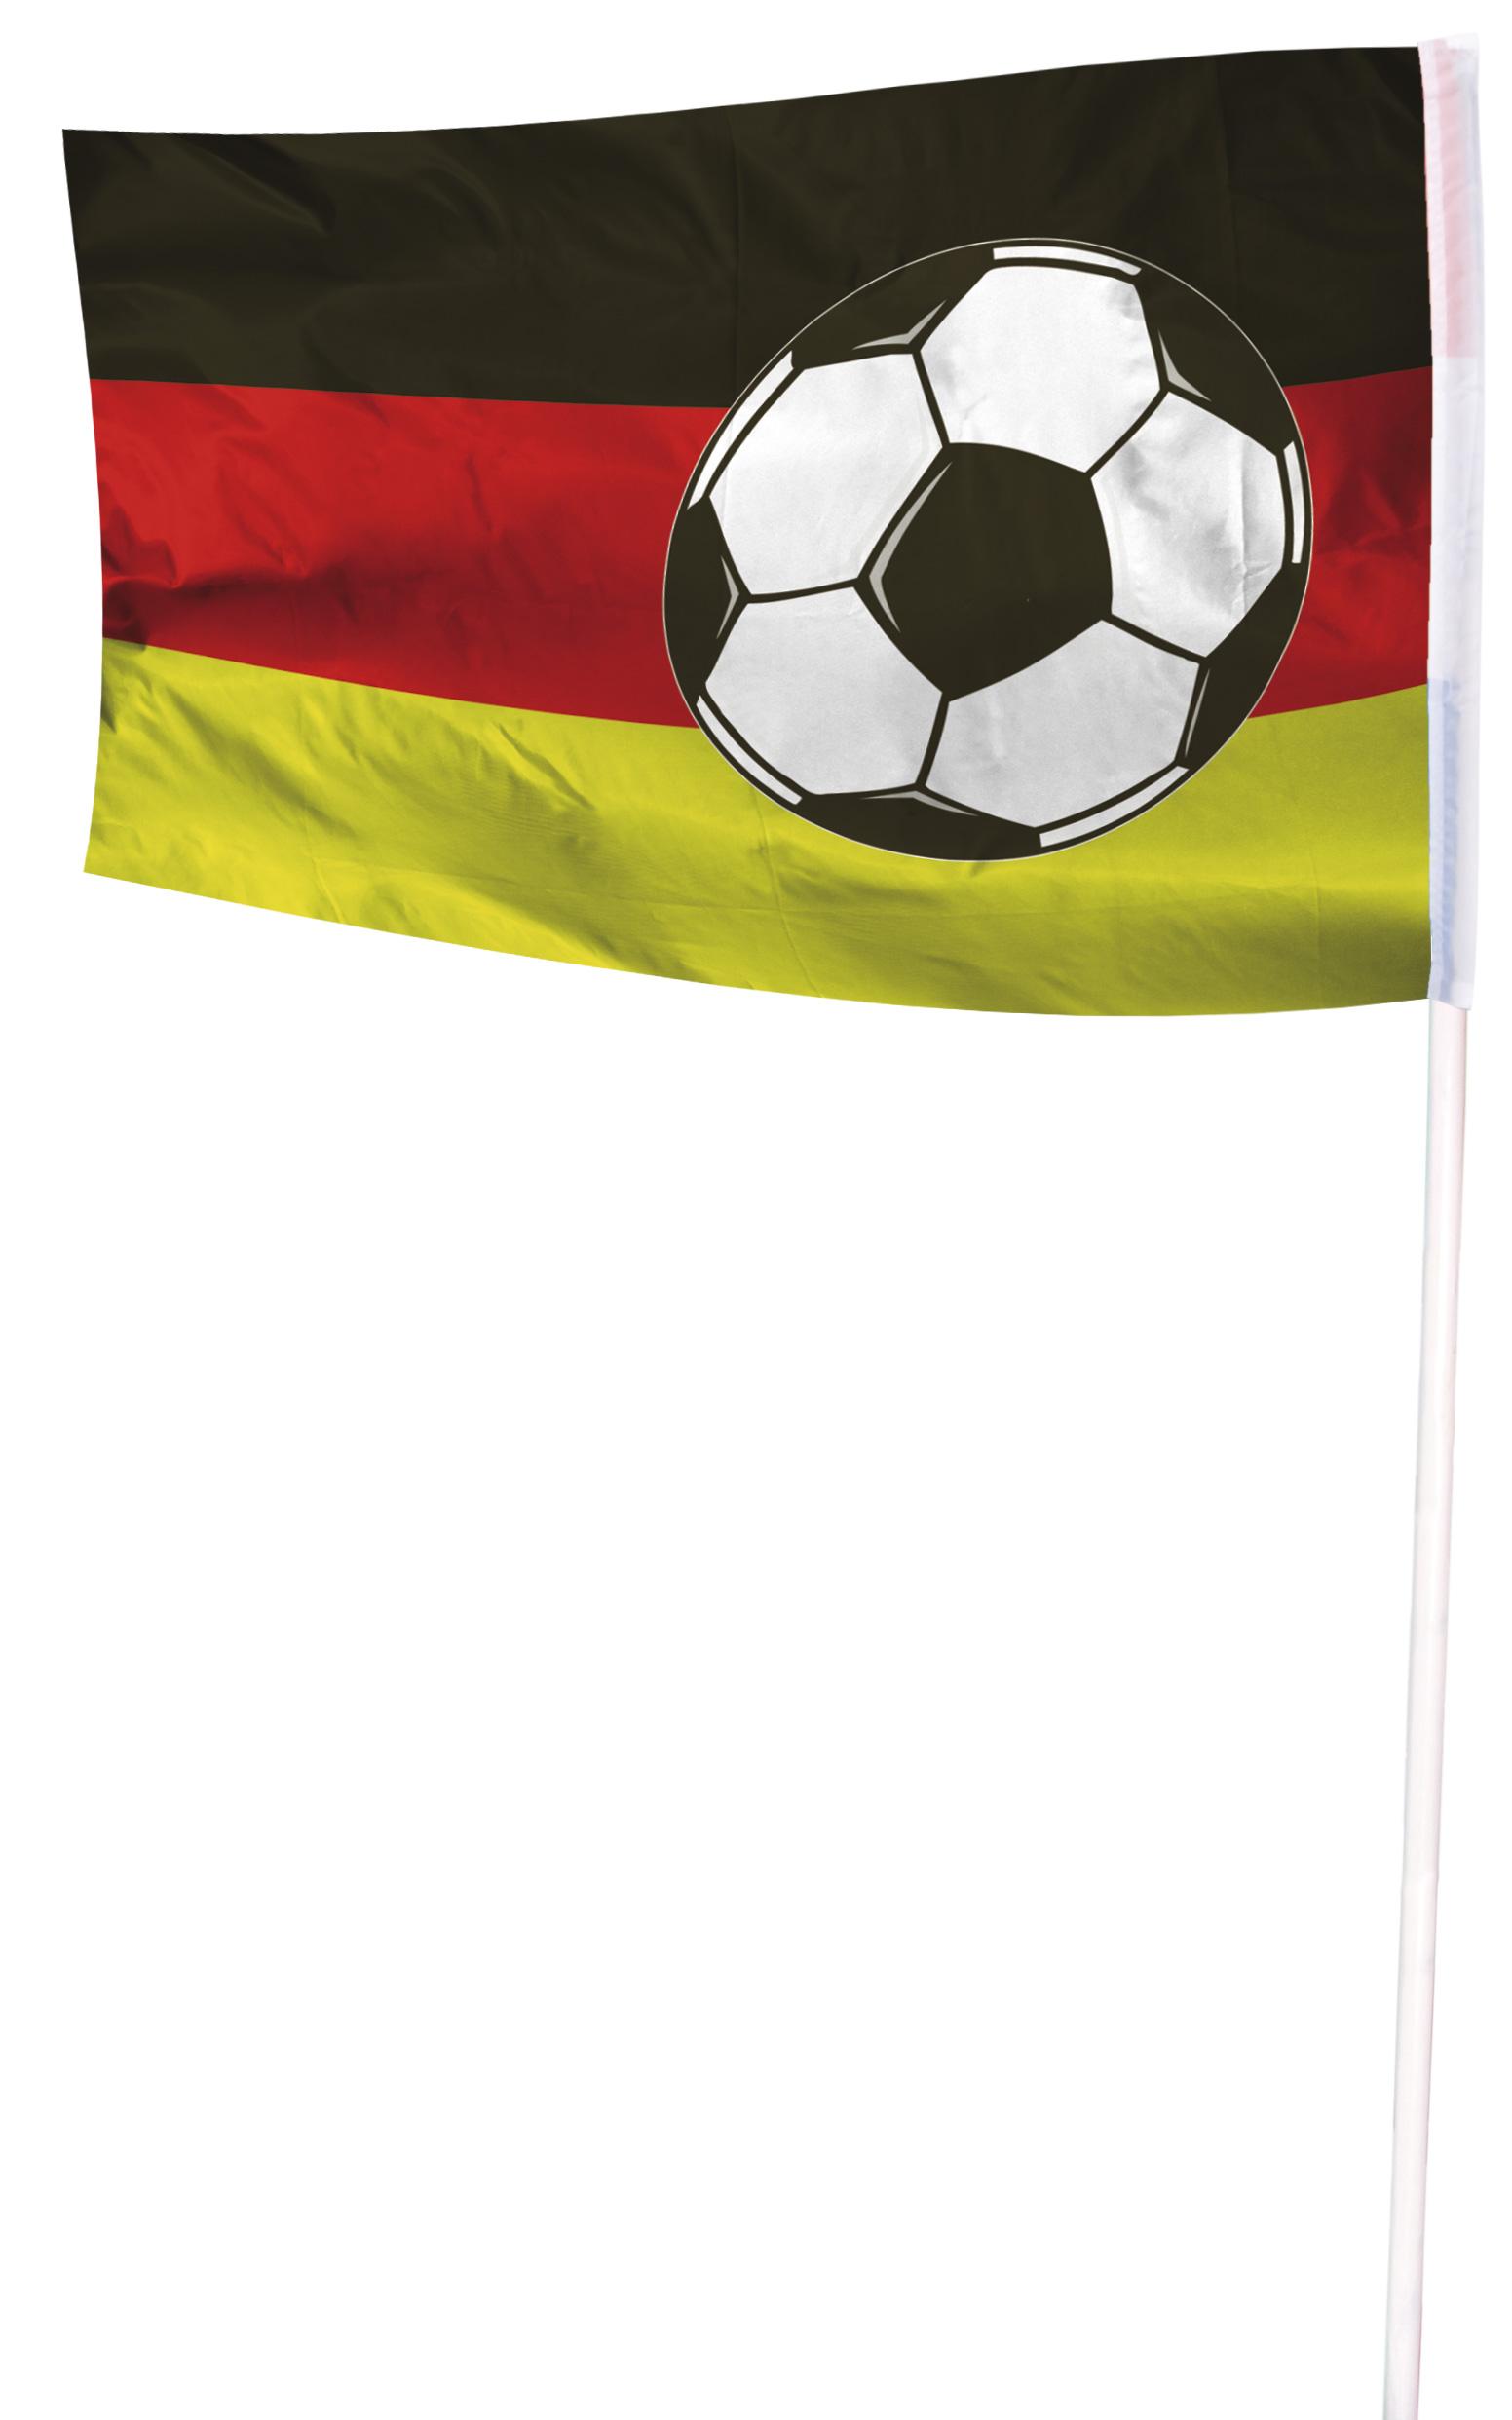 Gevelvlag Voetbal 100x150m zwart/rood/geel